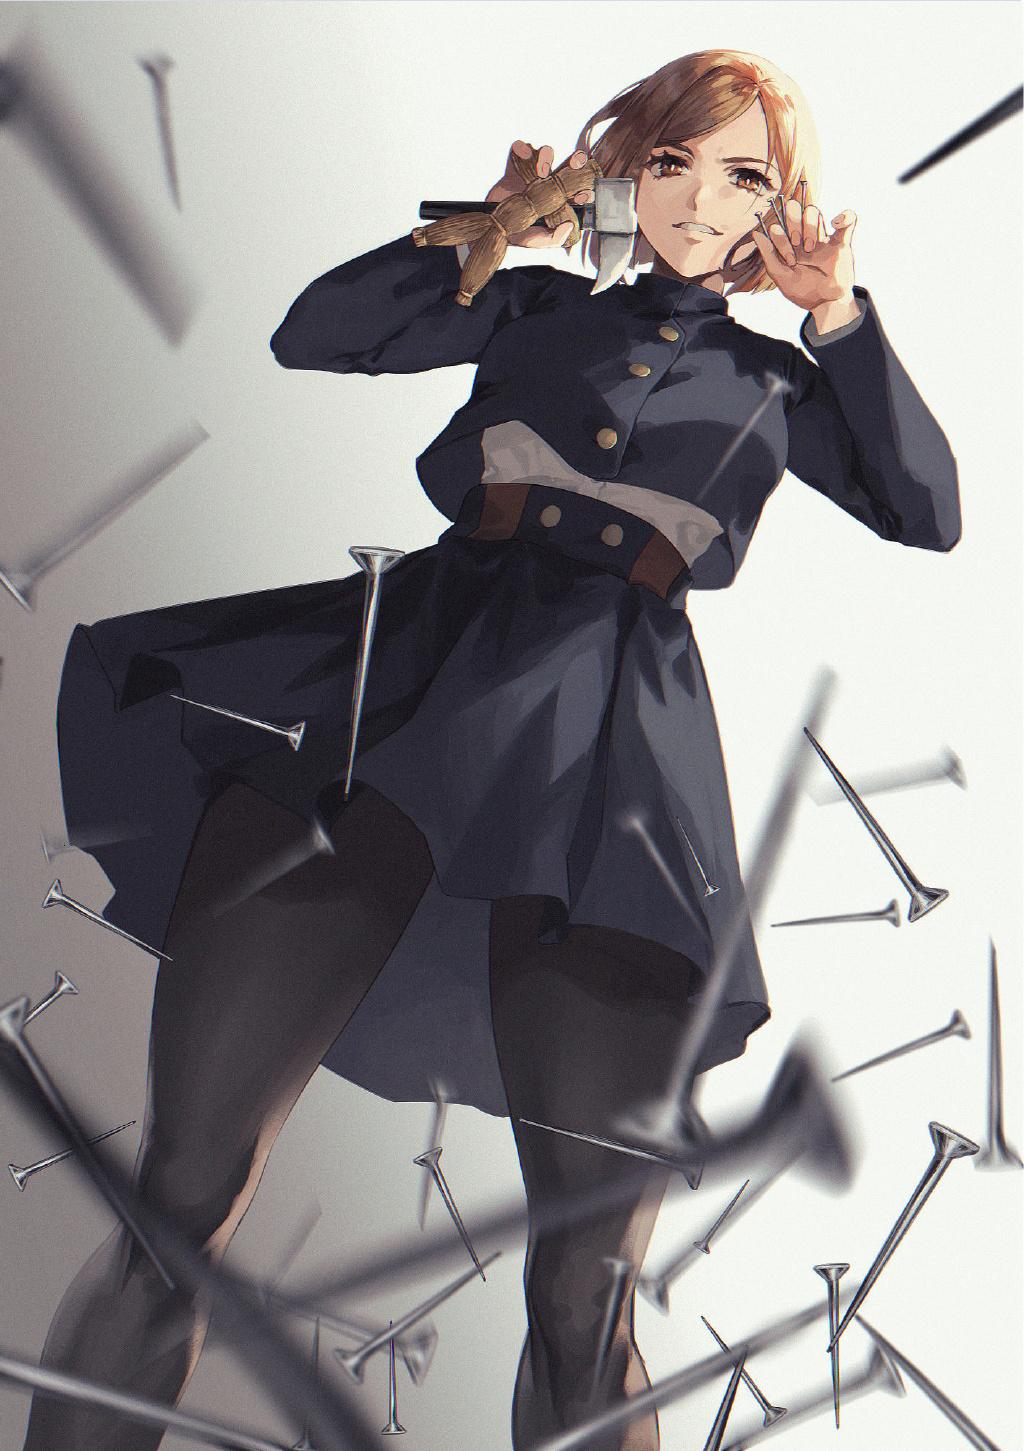 P站精选&蔷薇姐生日快乐!《咒术回战》钉崎野蔷薇壁纸特辑-Zhaiuu.Com-宅尤尤